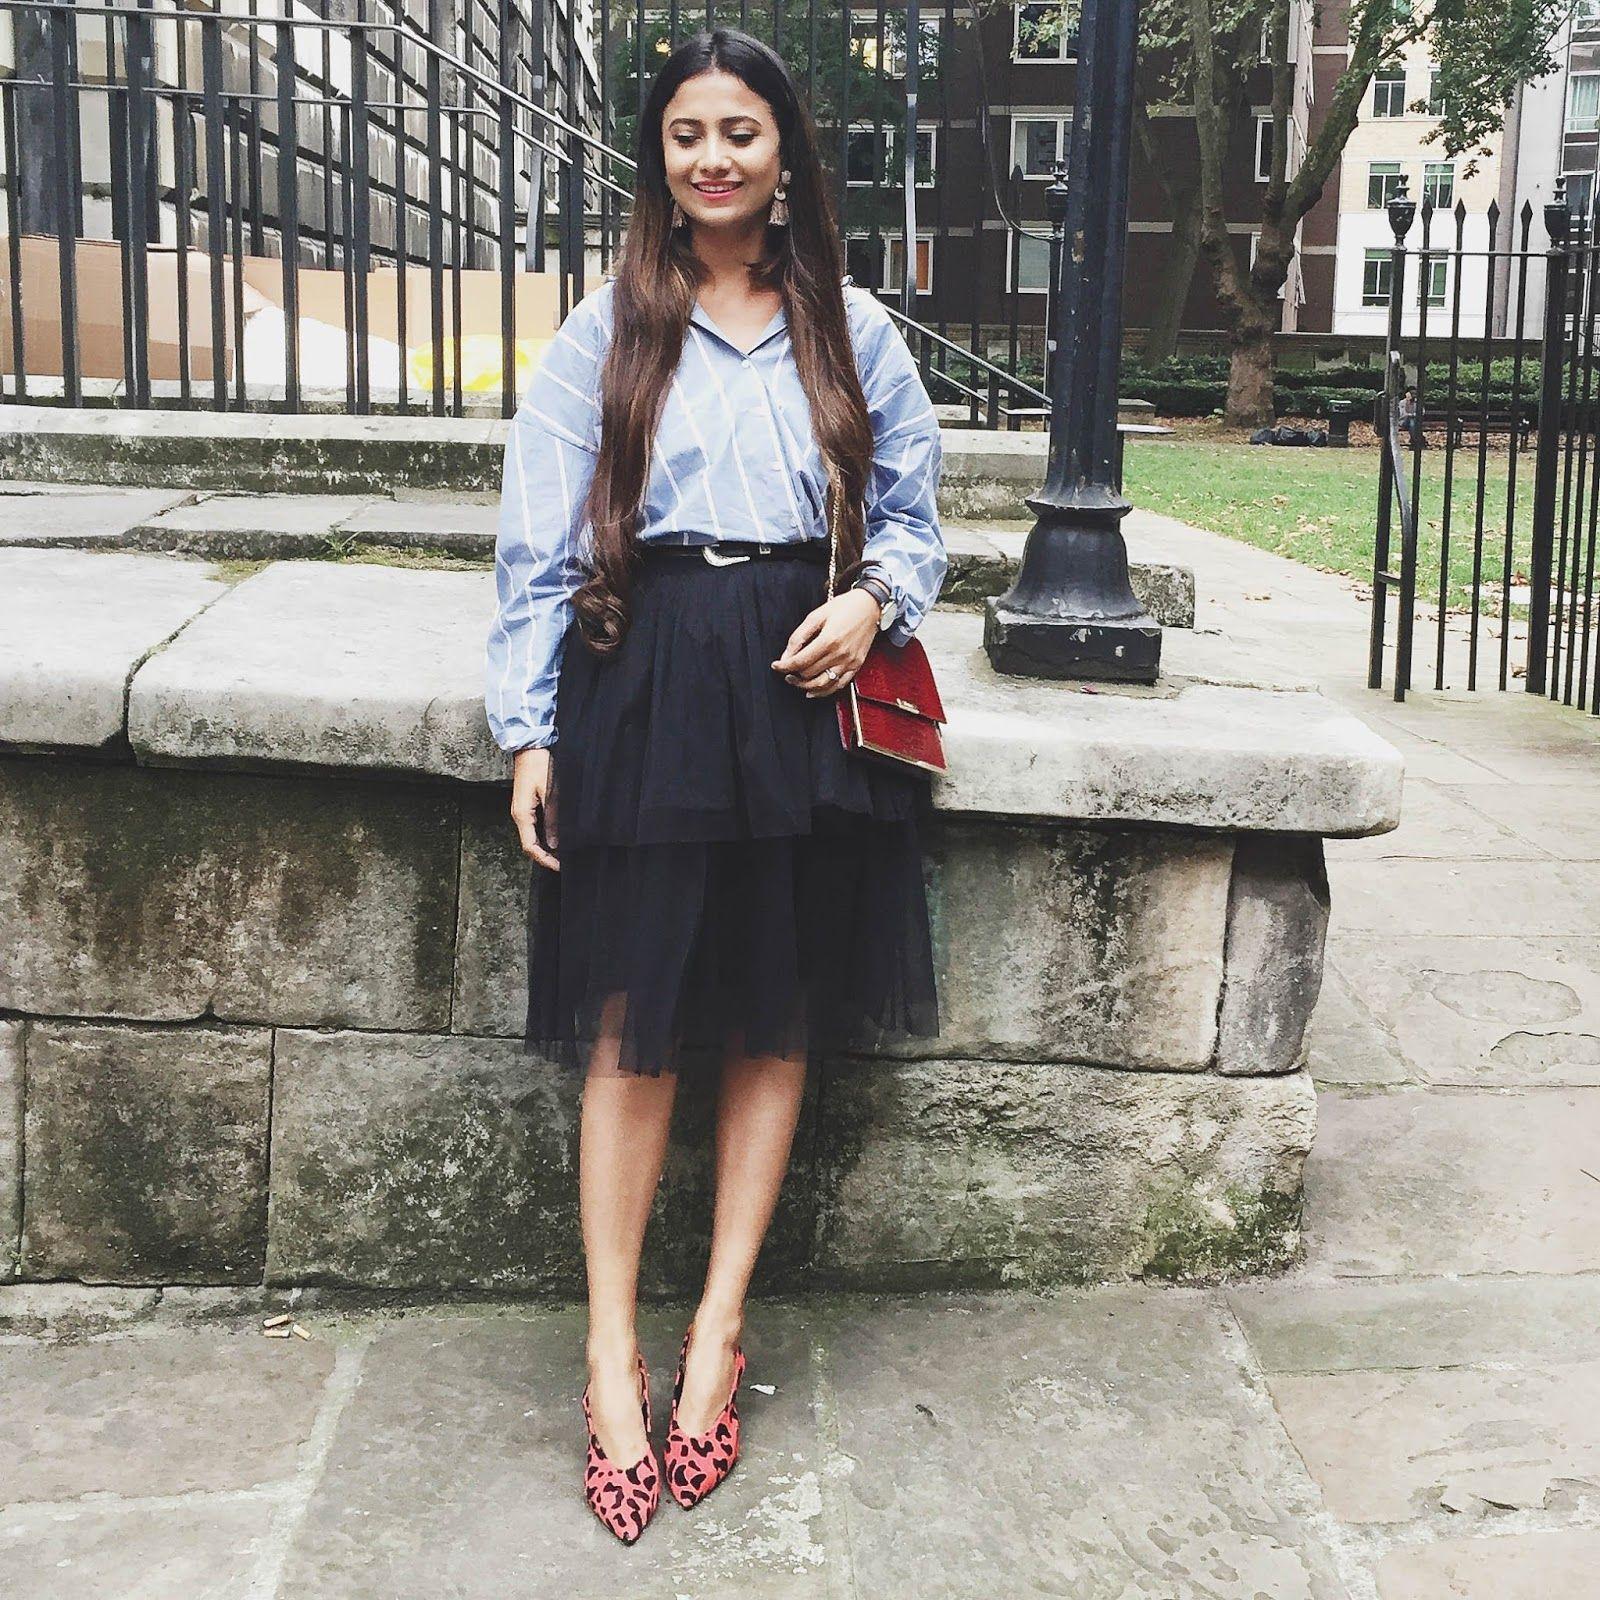 ashion week outfit, lfw, london fashion week, striped shirt casual, casual  chic